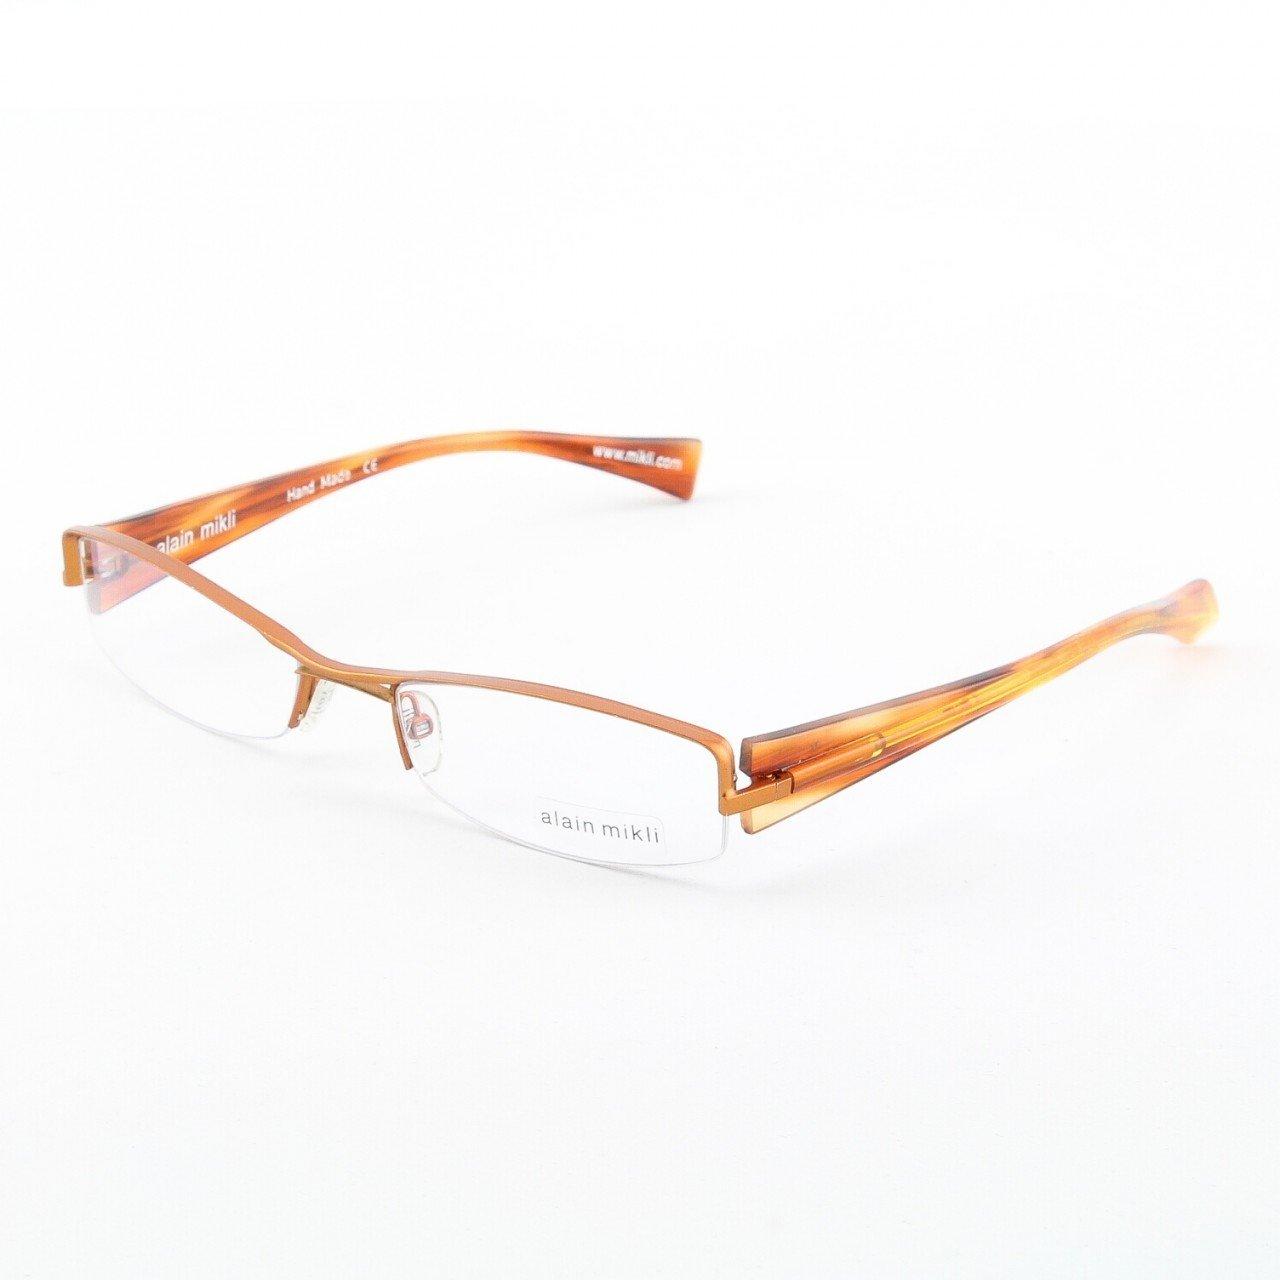 Alain Mikli Eyeglasses AL0656 Col. 18 Matte Copper Metallic Frame with Amber Temples